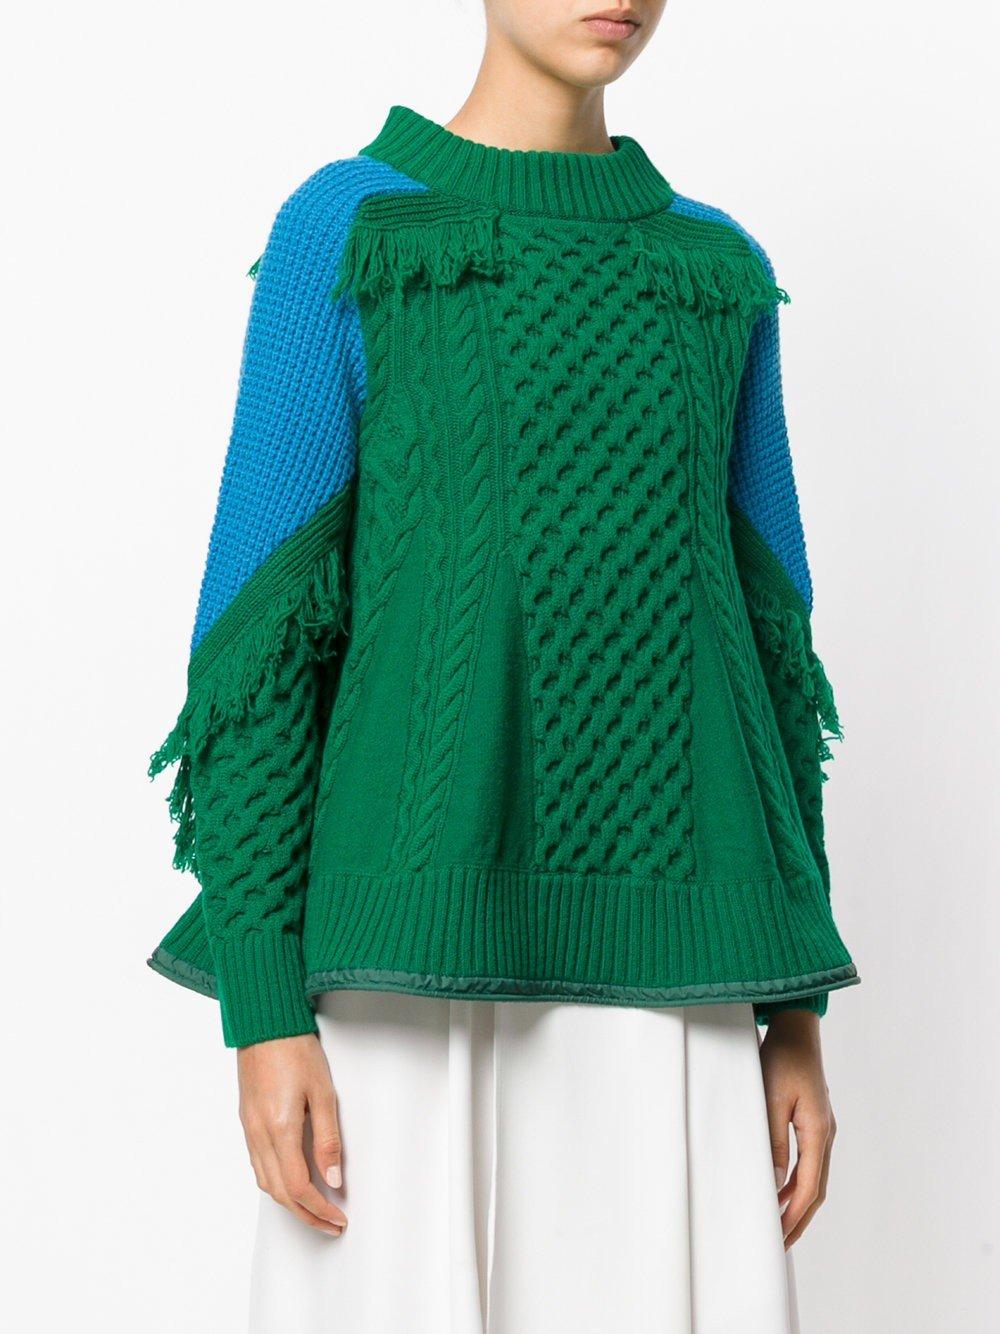 modniye-viazaniye-veshchi-svoimi-rukami-22 Модные вязаные вещи 2019 2020 года своими руками фото тенденции